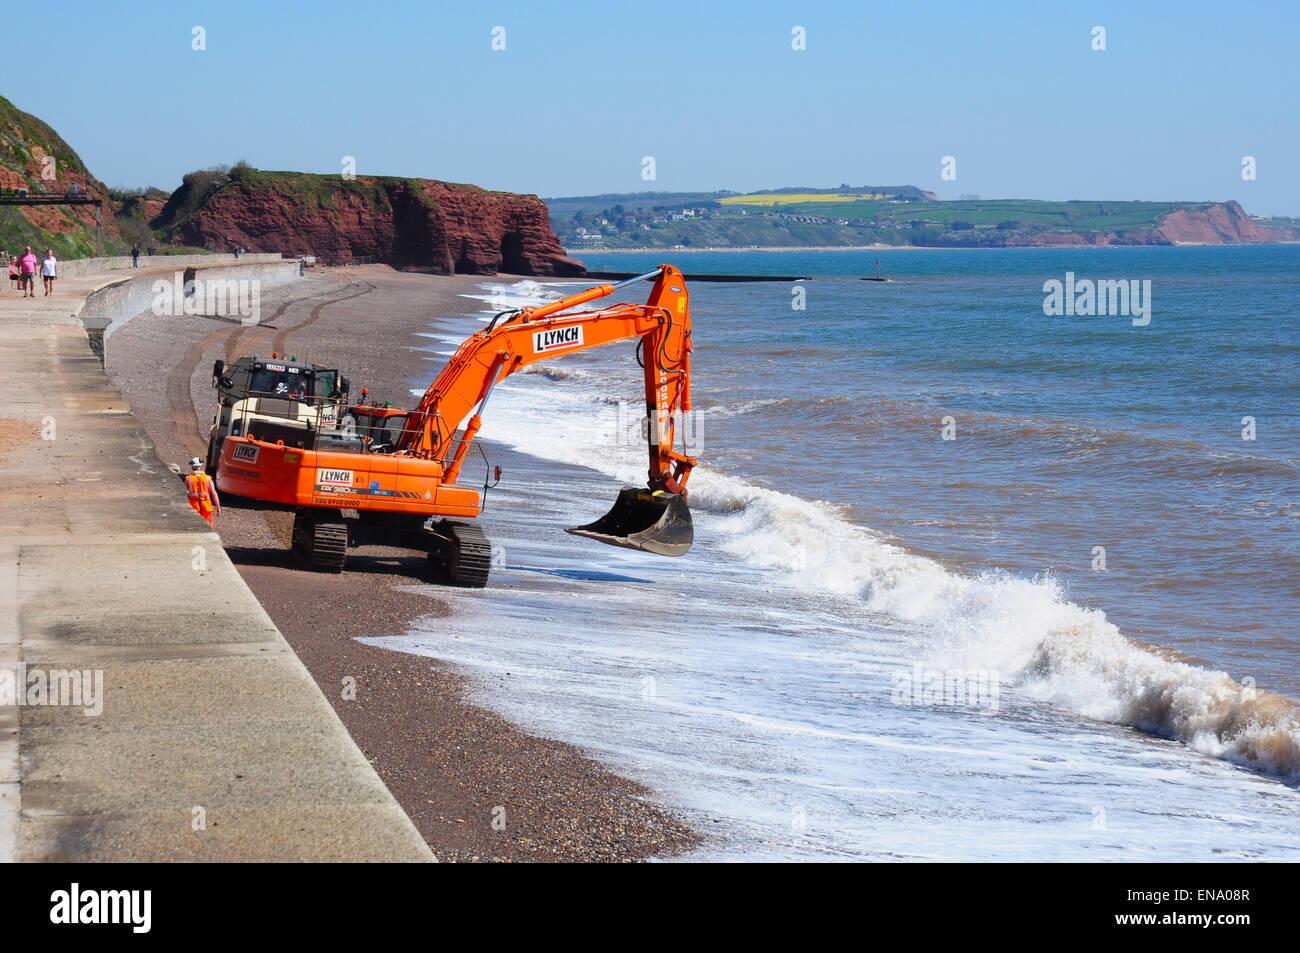 Maintenance digger on the beach near Dawlish, Devon, England, UK - Stock Image